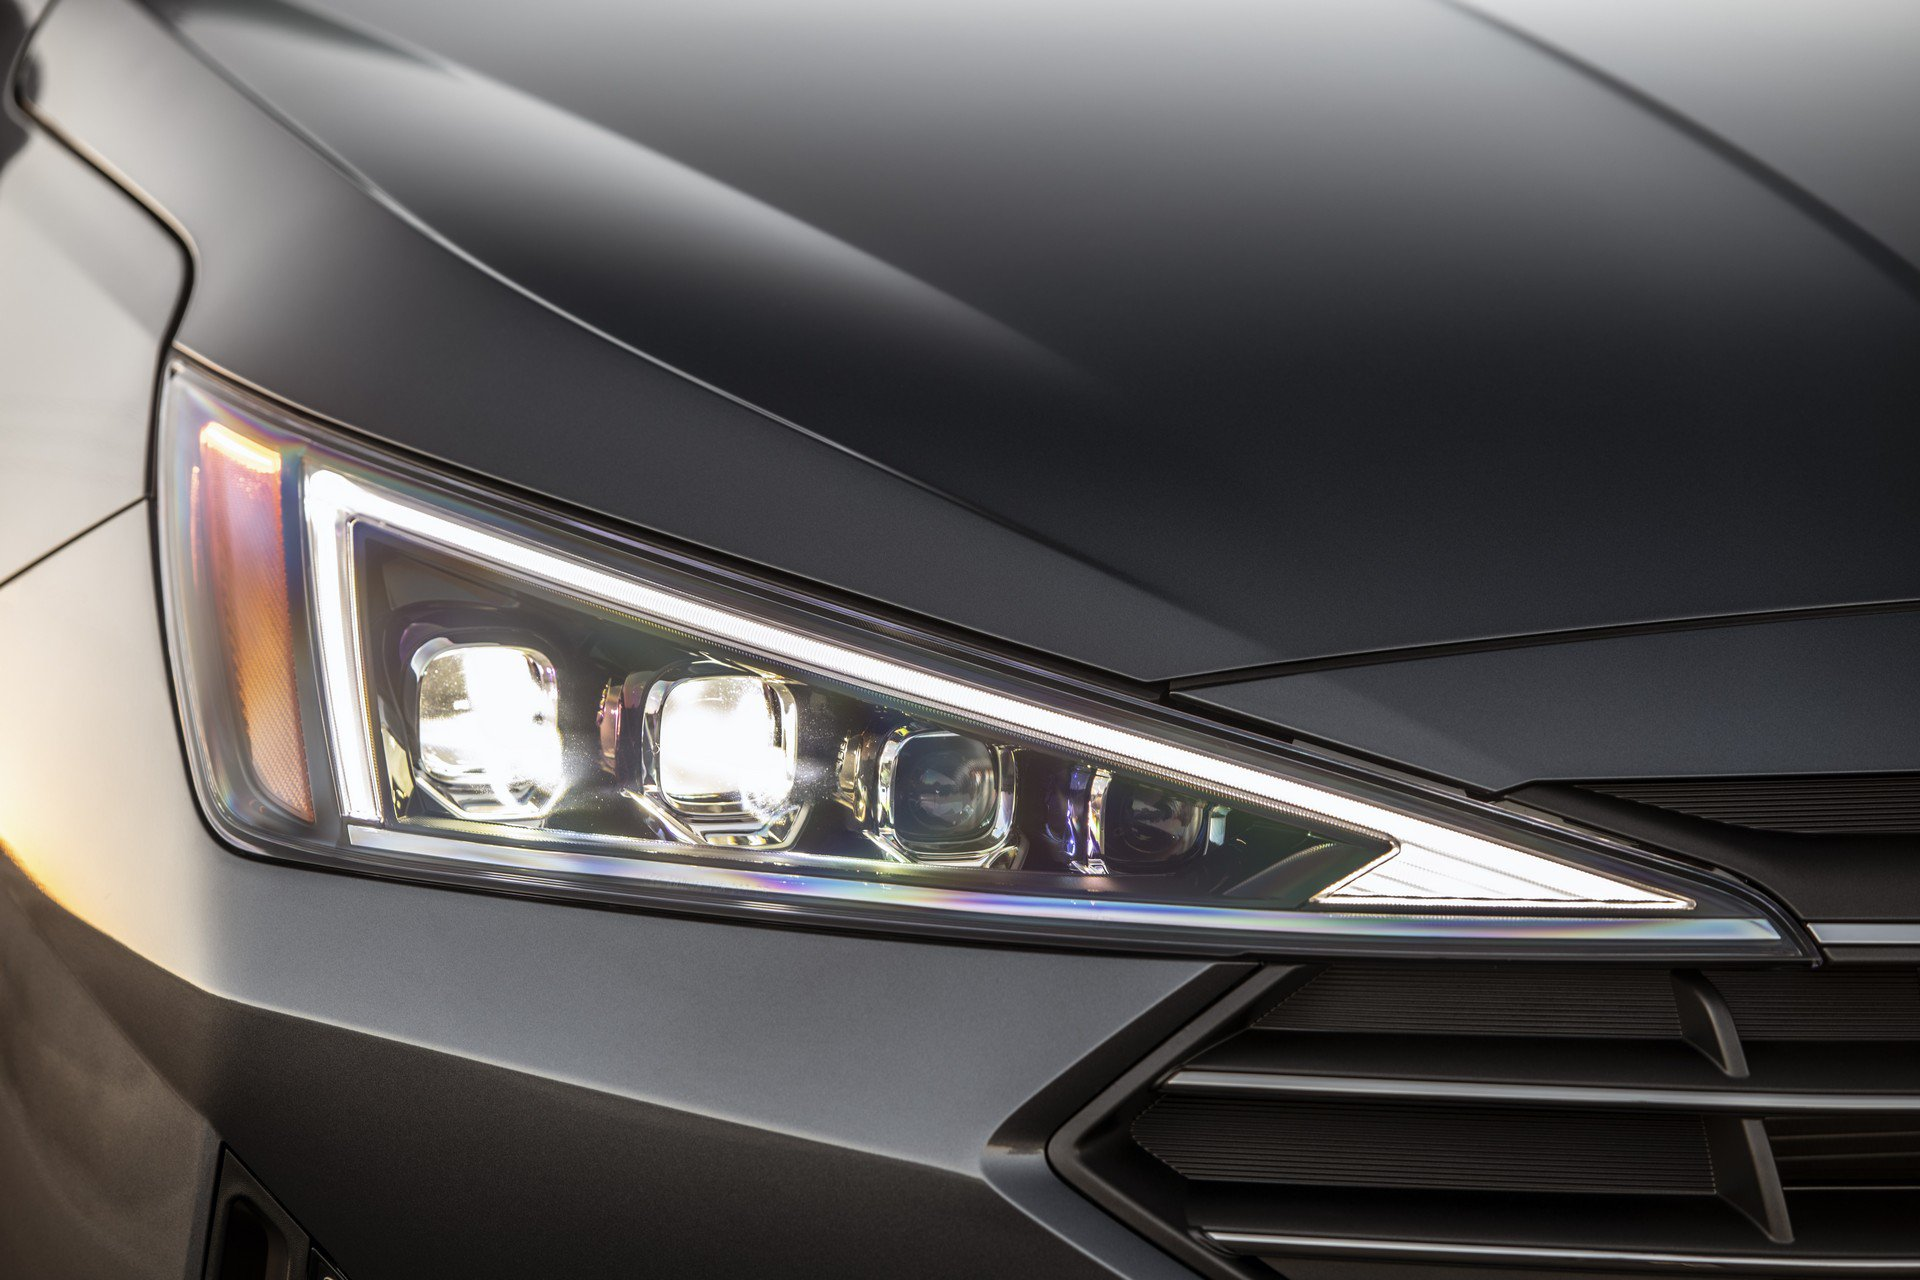 Hyundai Elantra 2019 (11)